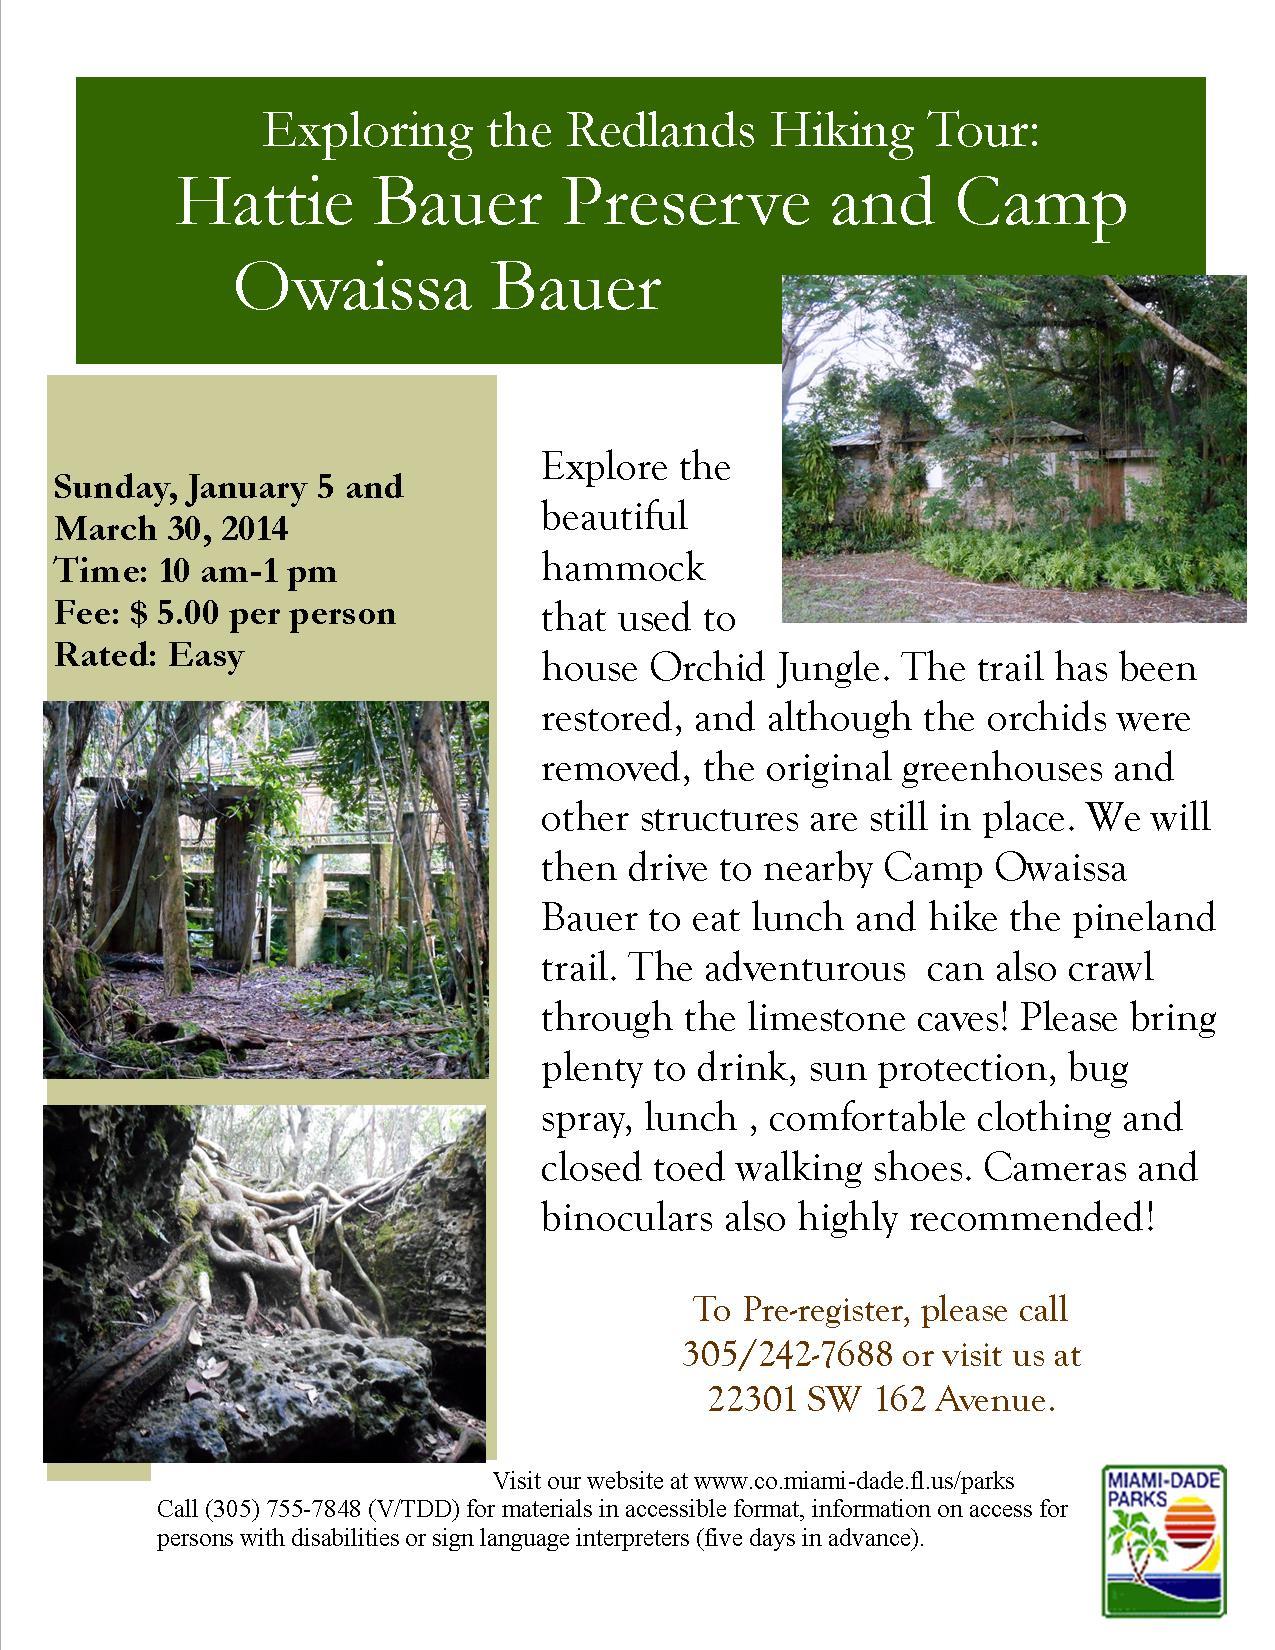 Exploring The Redlands Hiking Tour Hattie Bauer Preserve